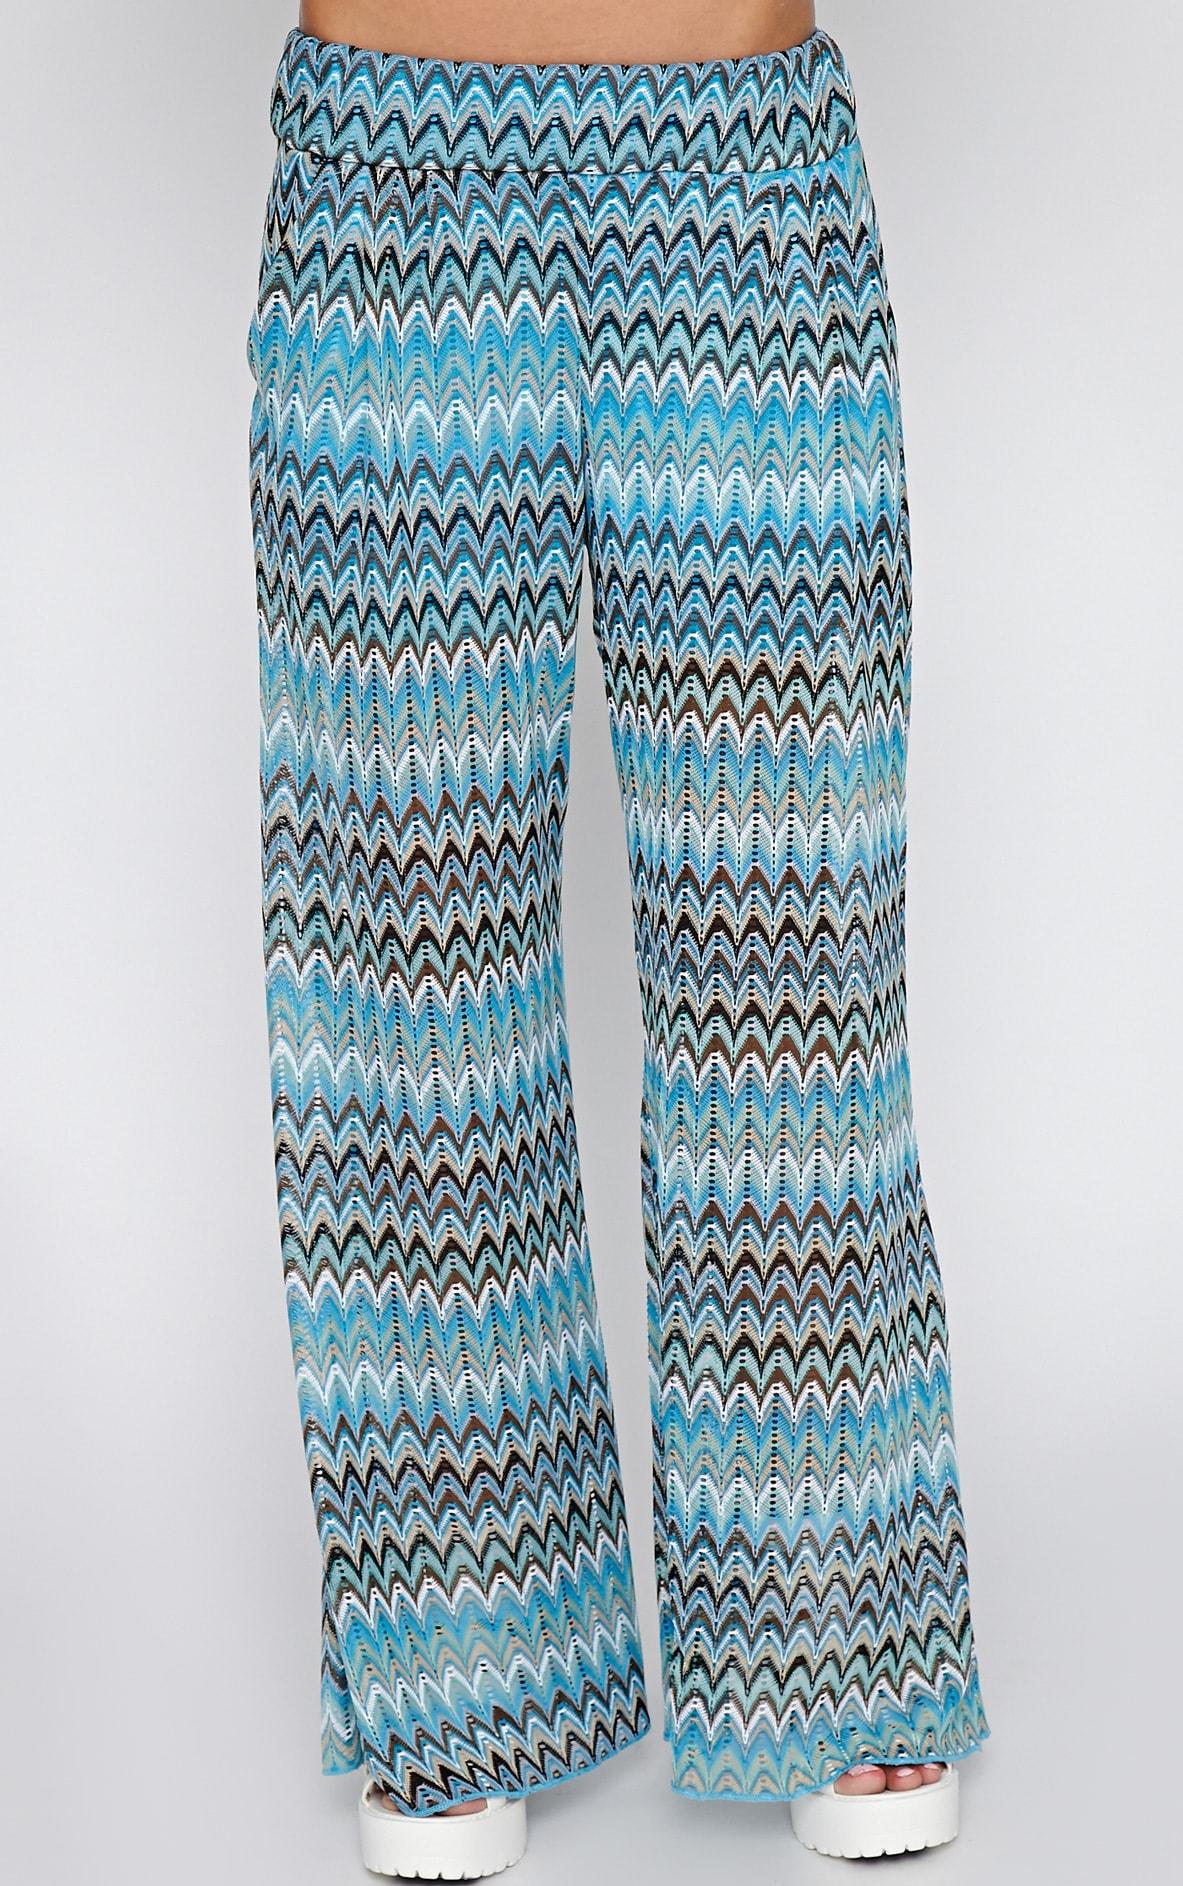 Machiko Blue Zig Zag Trouser 2